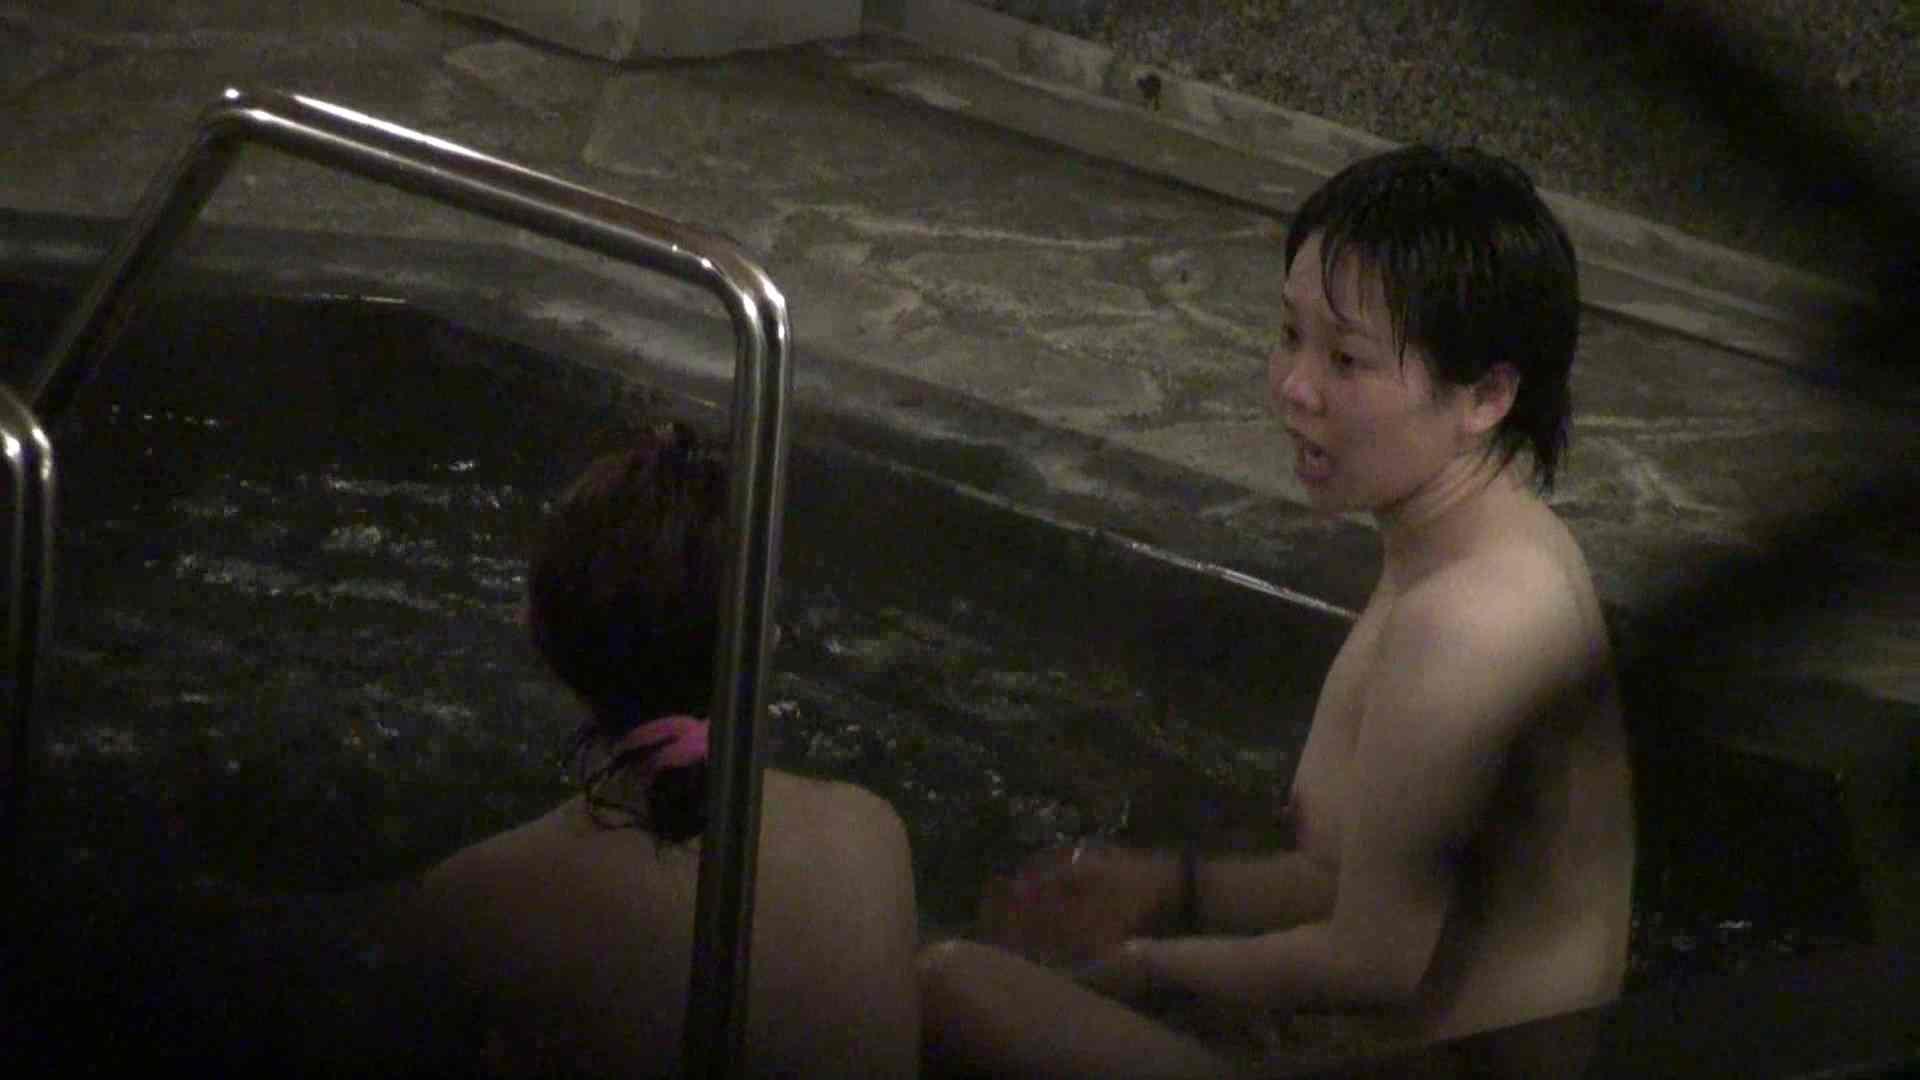 Aquaな露天風呂Vol.394 盗撮シリーズ | 露天風呂編  78PIX 67